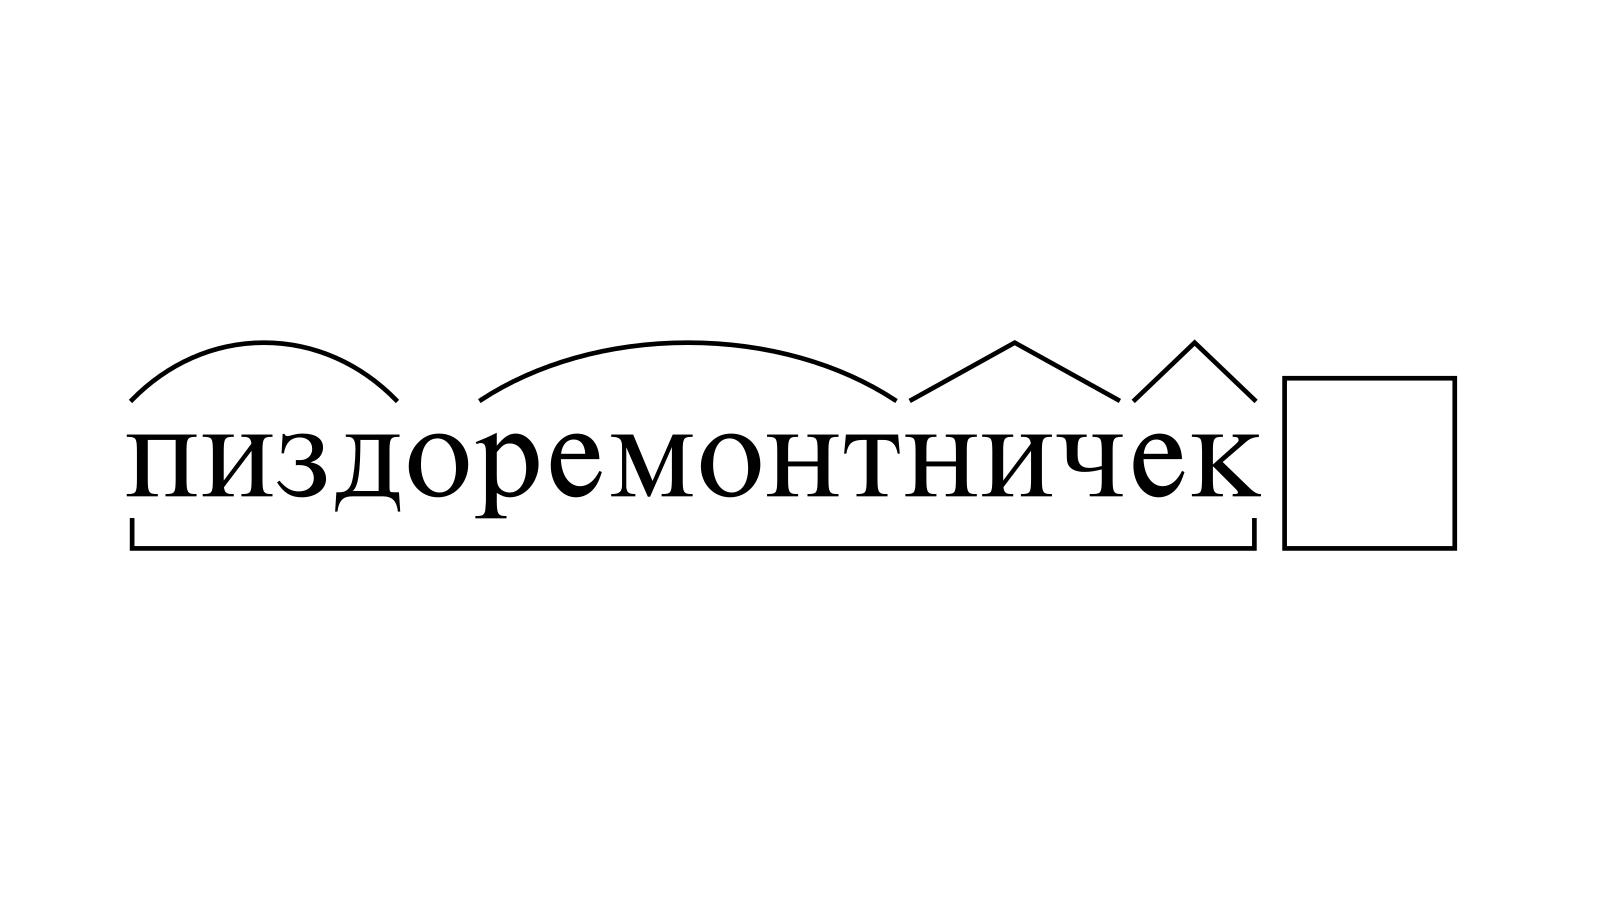 Разбор слова «пиздоремонтничек» по составу